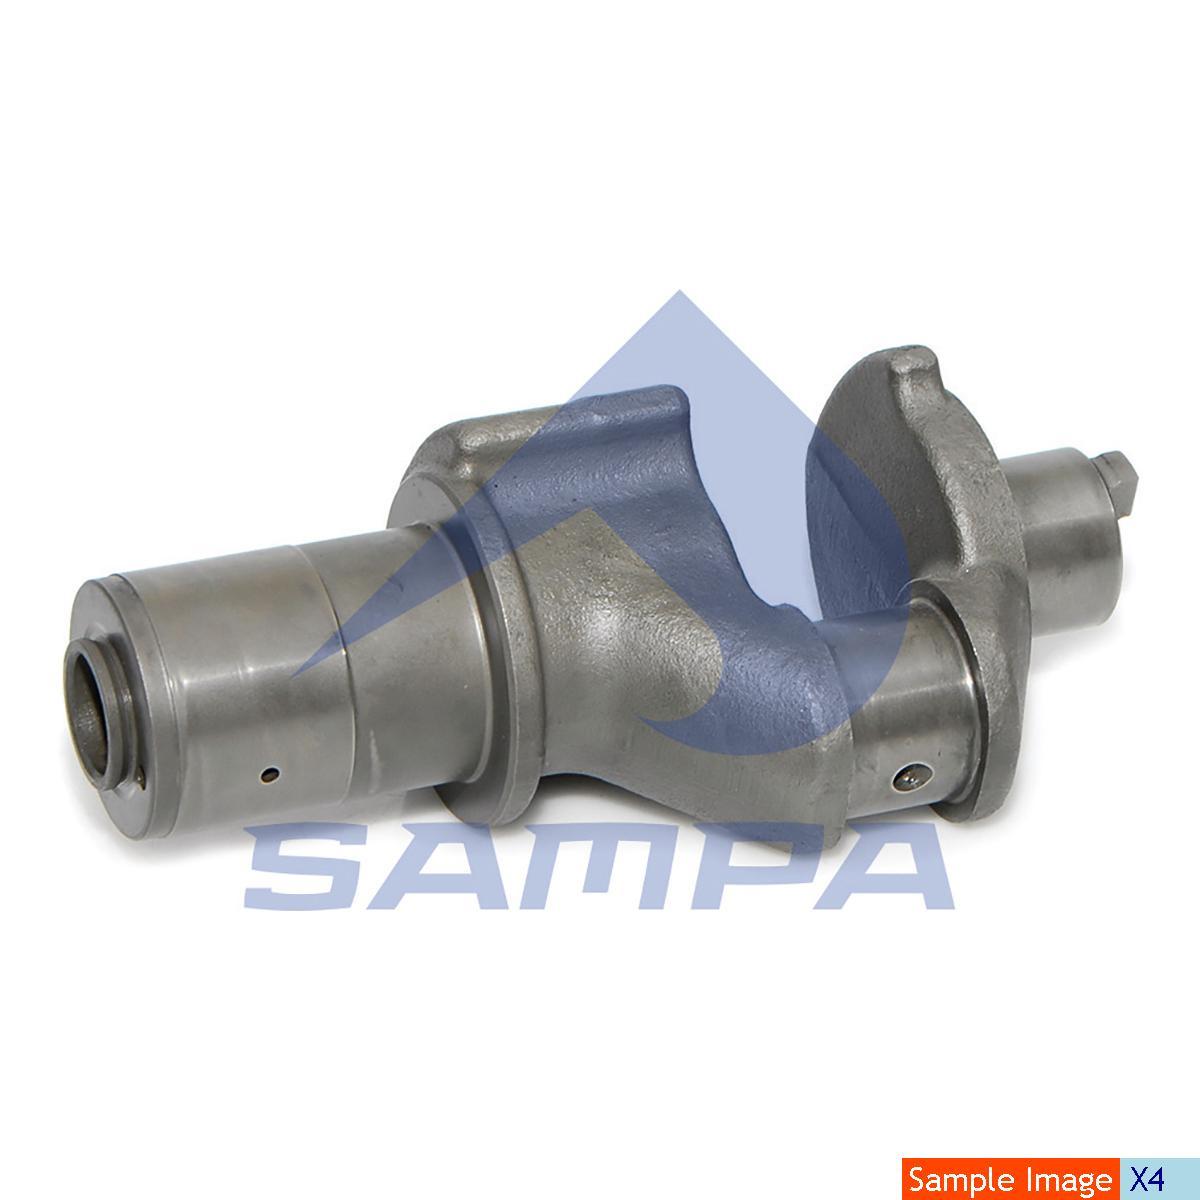 Crank Shaft, Cylinder Block, Man, Compressed Air System